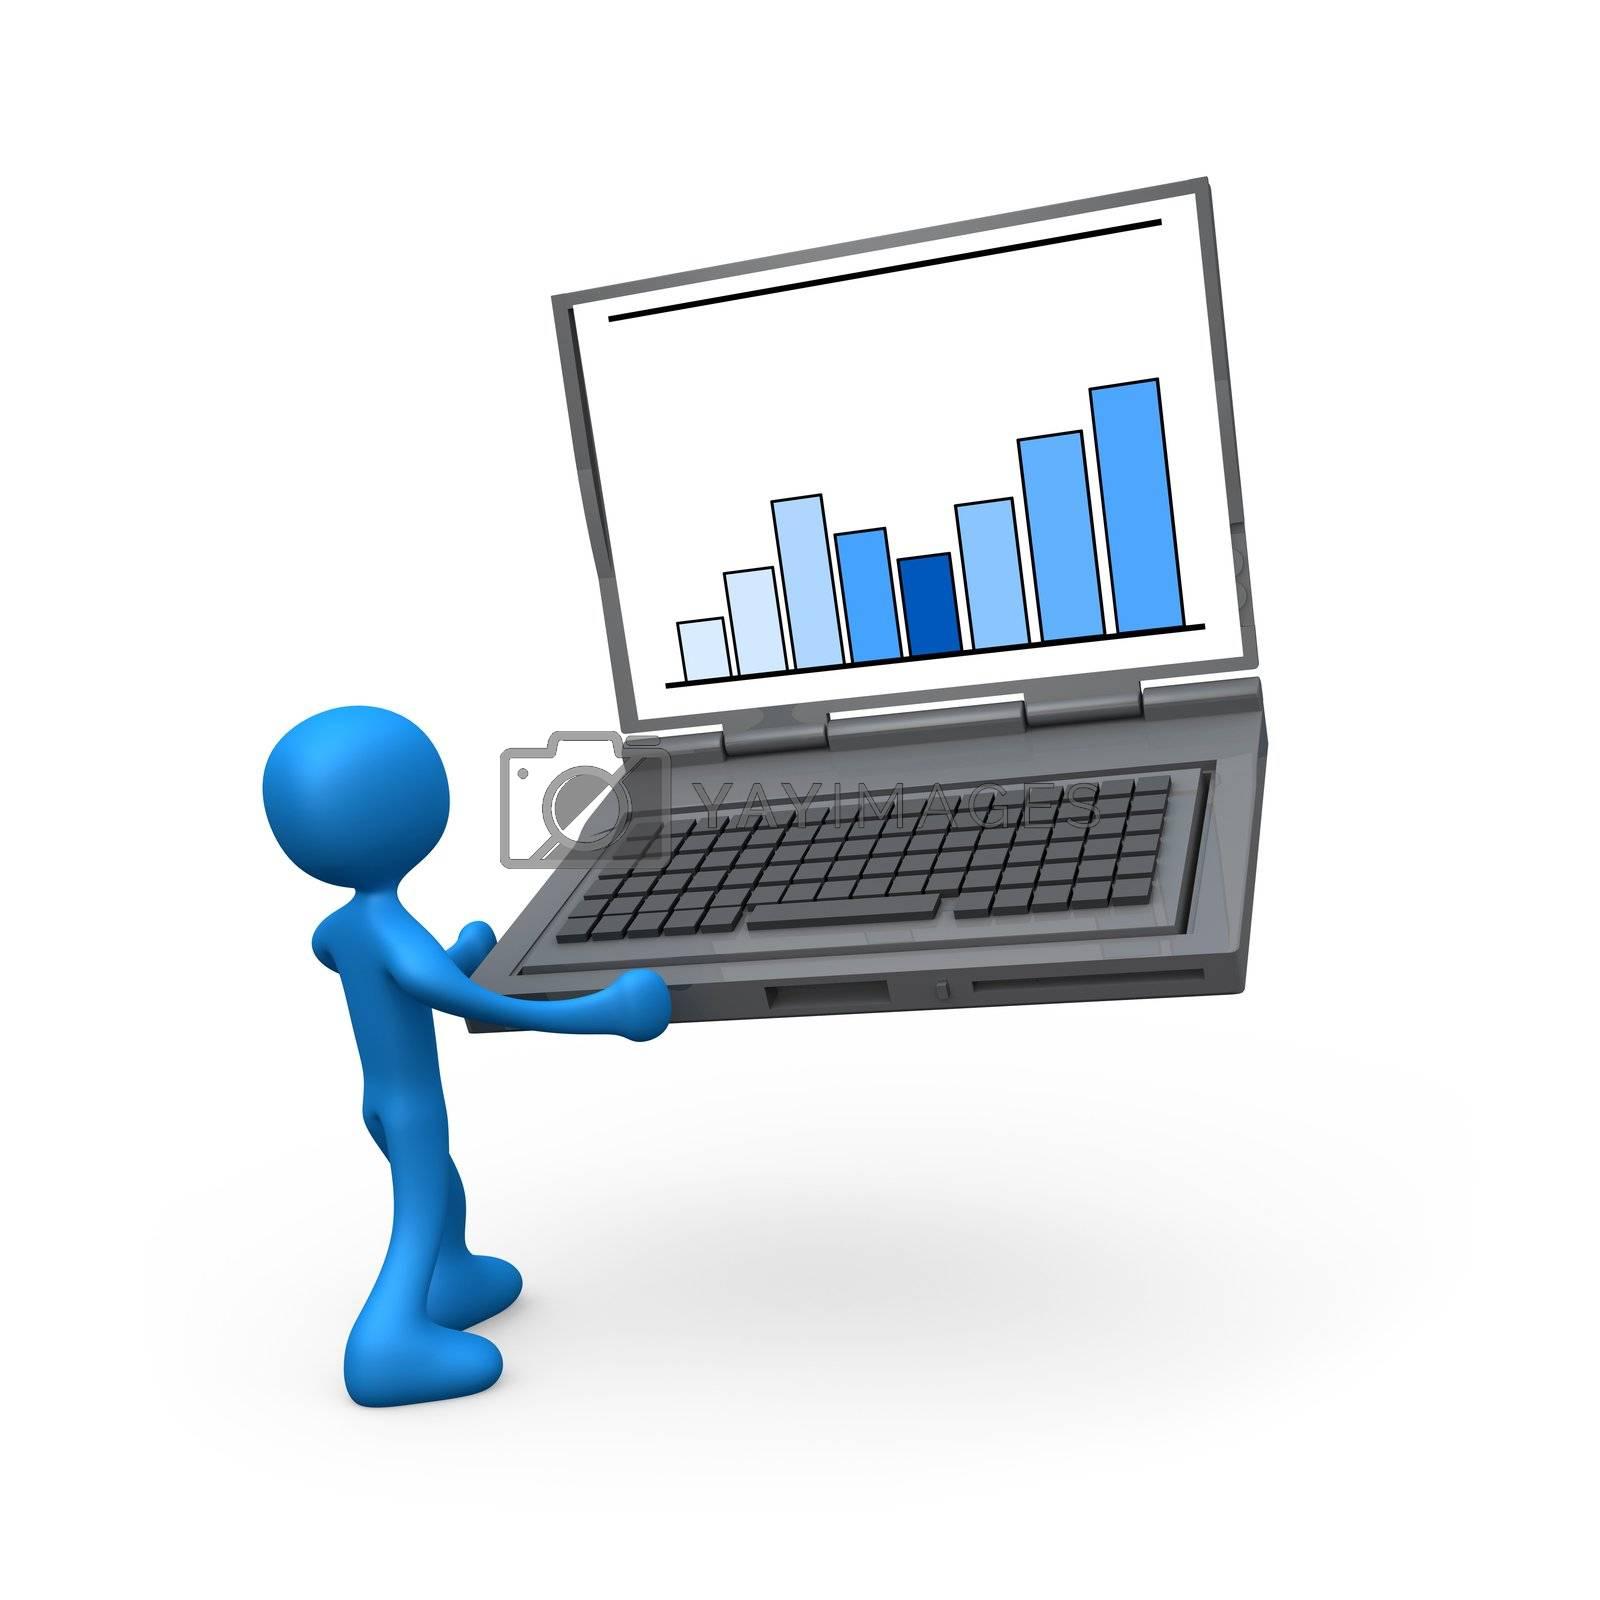 Portable Statistics by 3pod